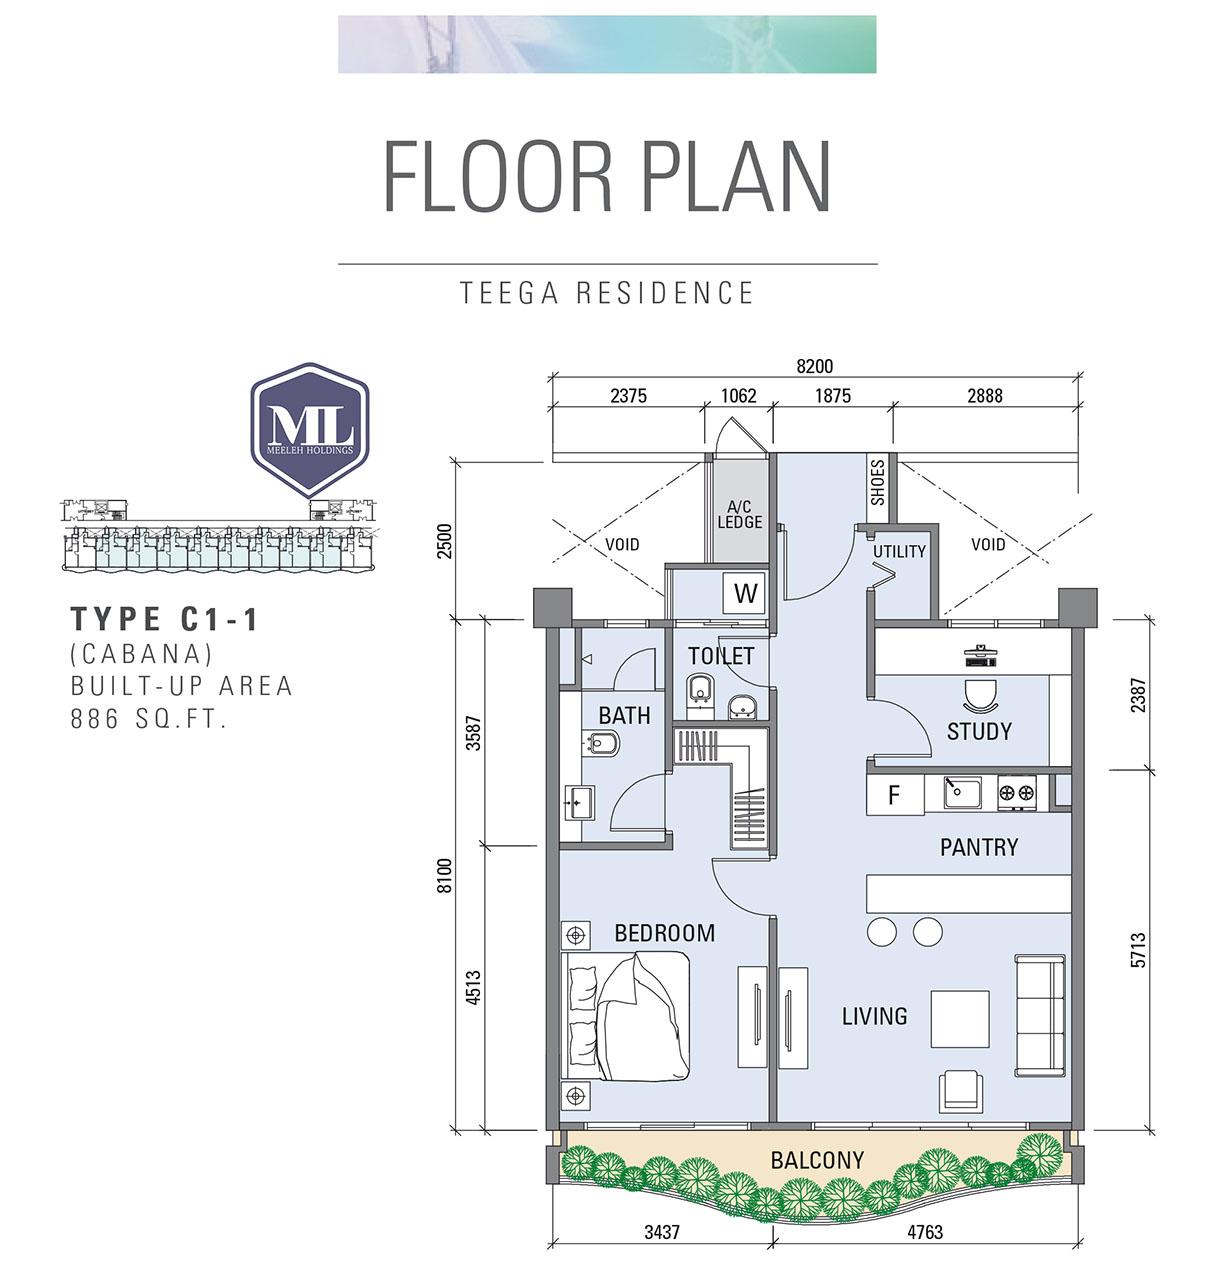 Teega Residences C1-1